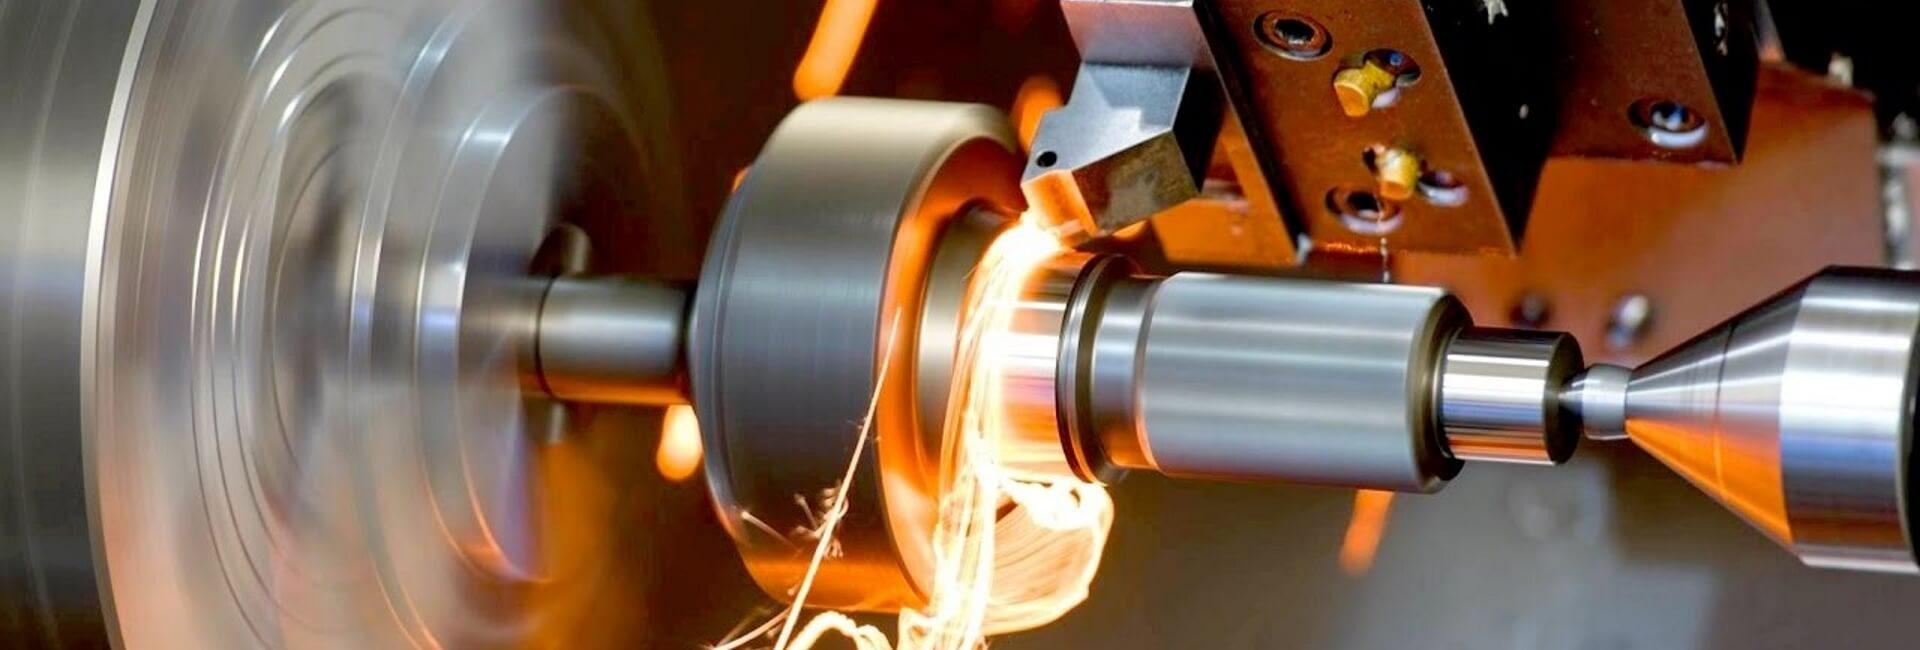 Обработка металла на карусельном токарном станке